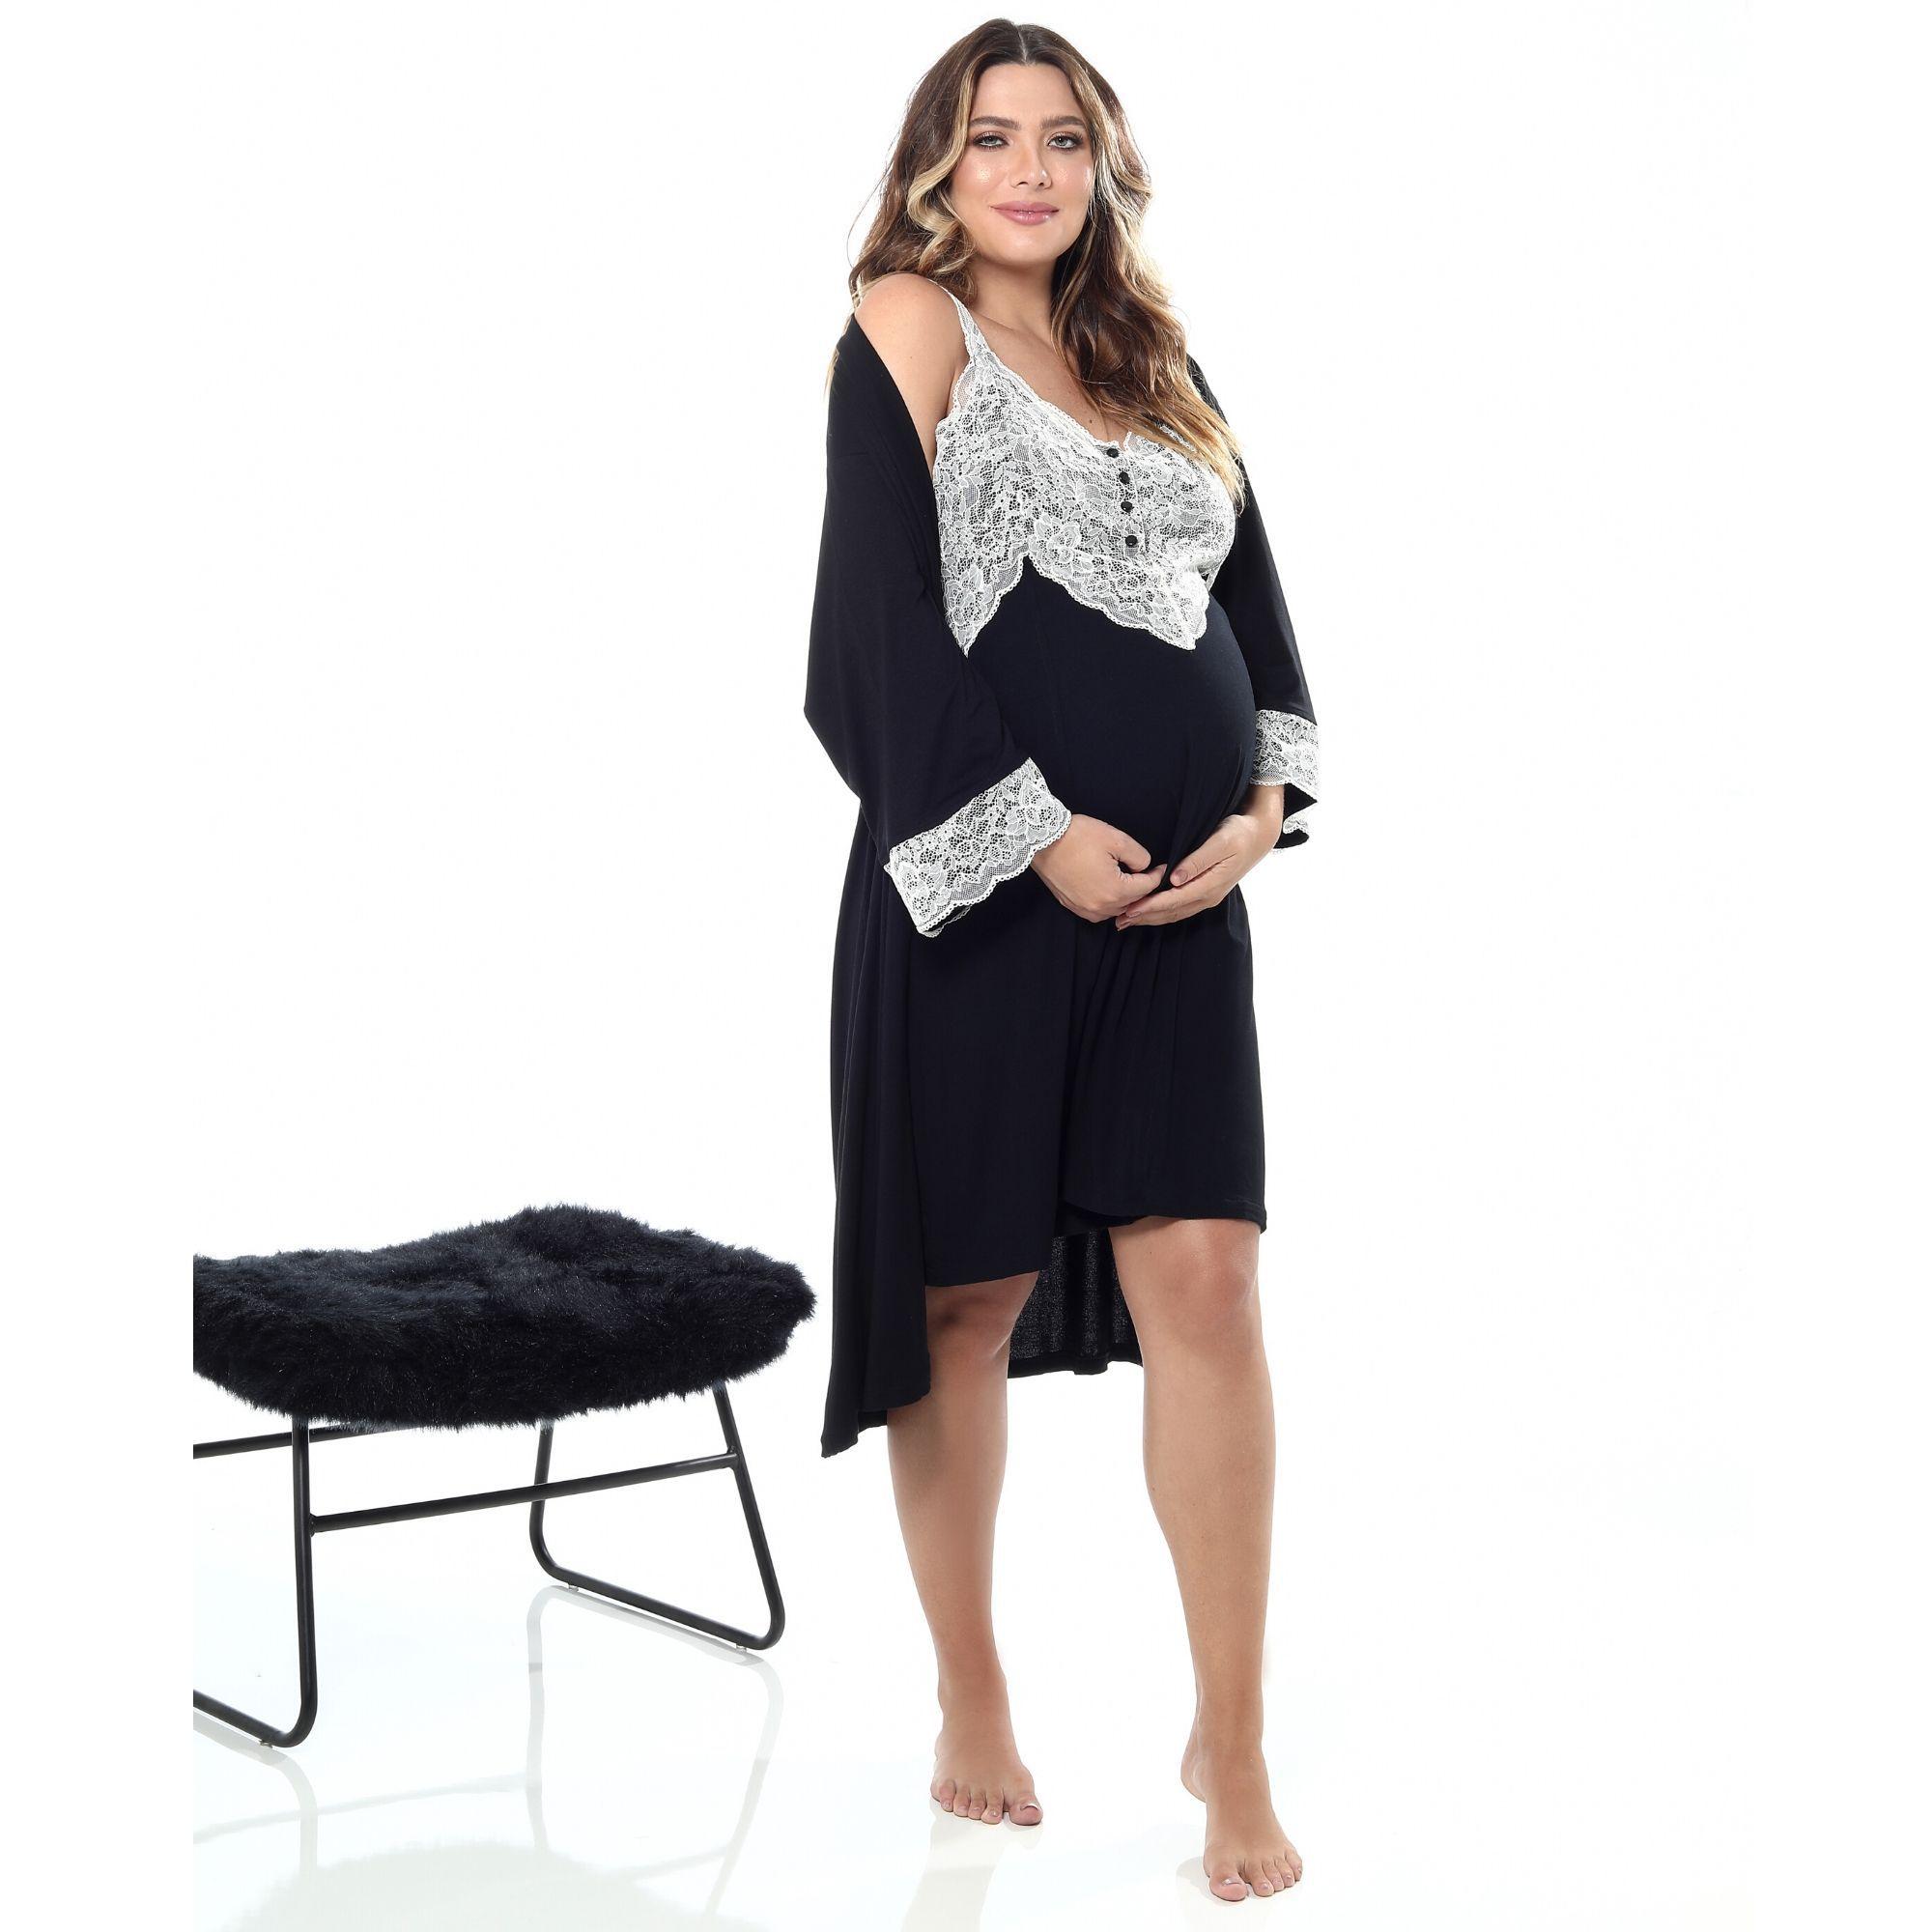 Camisola curta viscolycra e renda preta